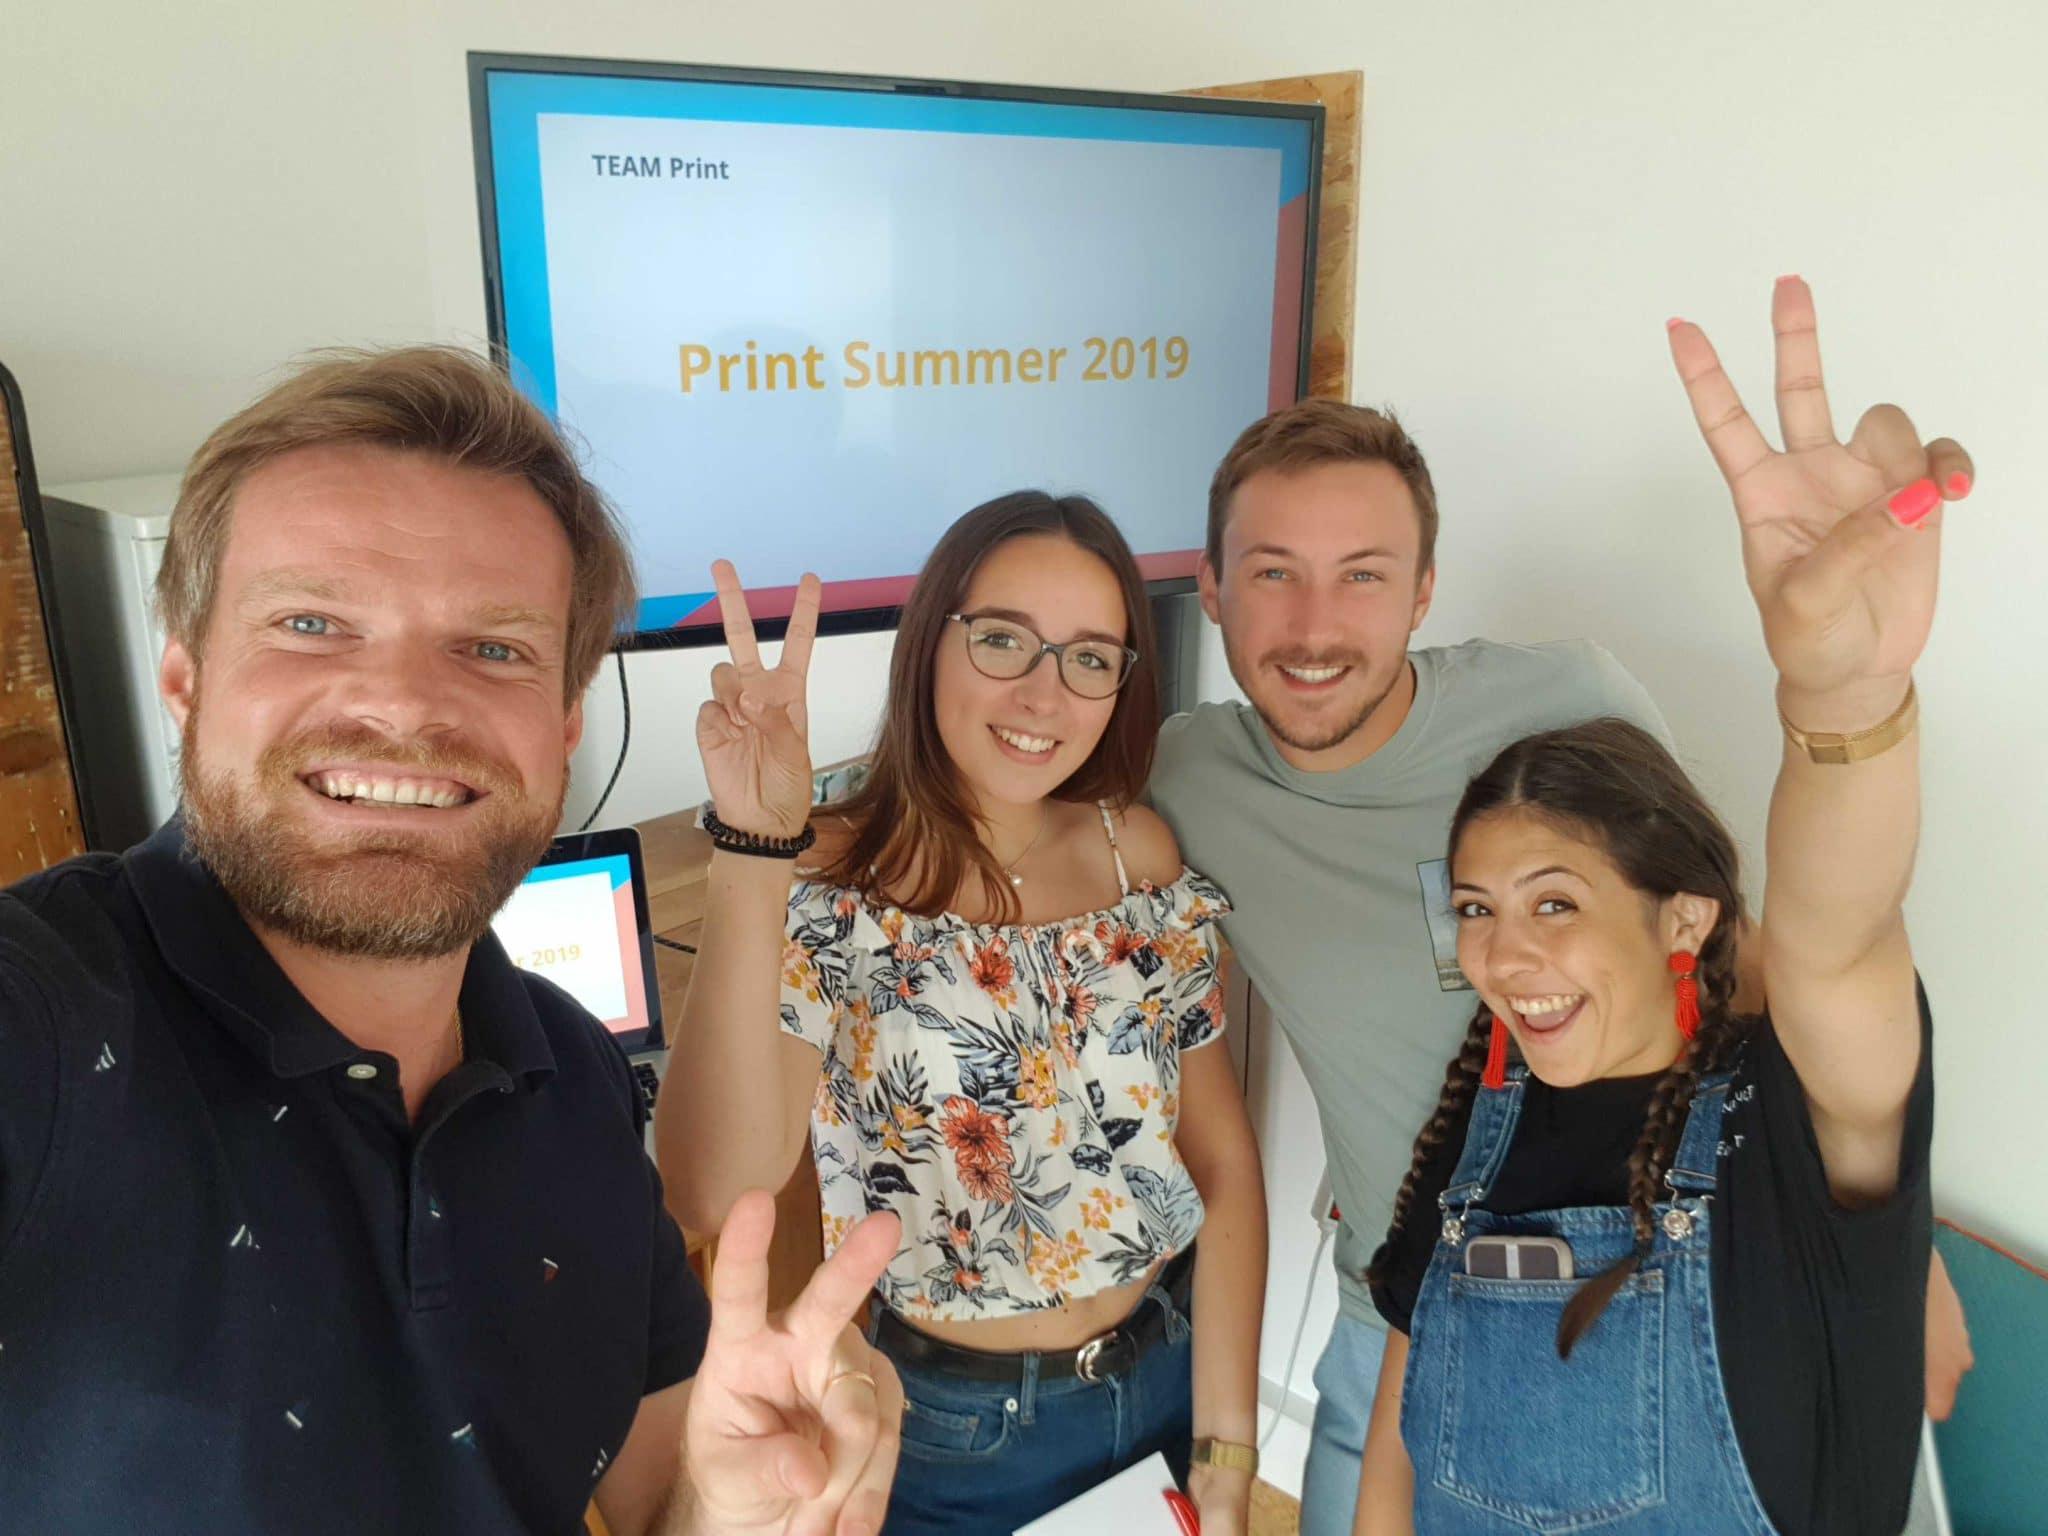 Team Print qui imprime vos cartes postales ete 2019 Fizzer